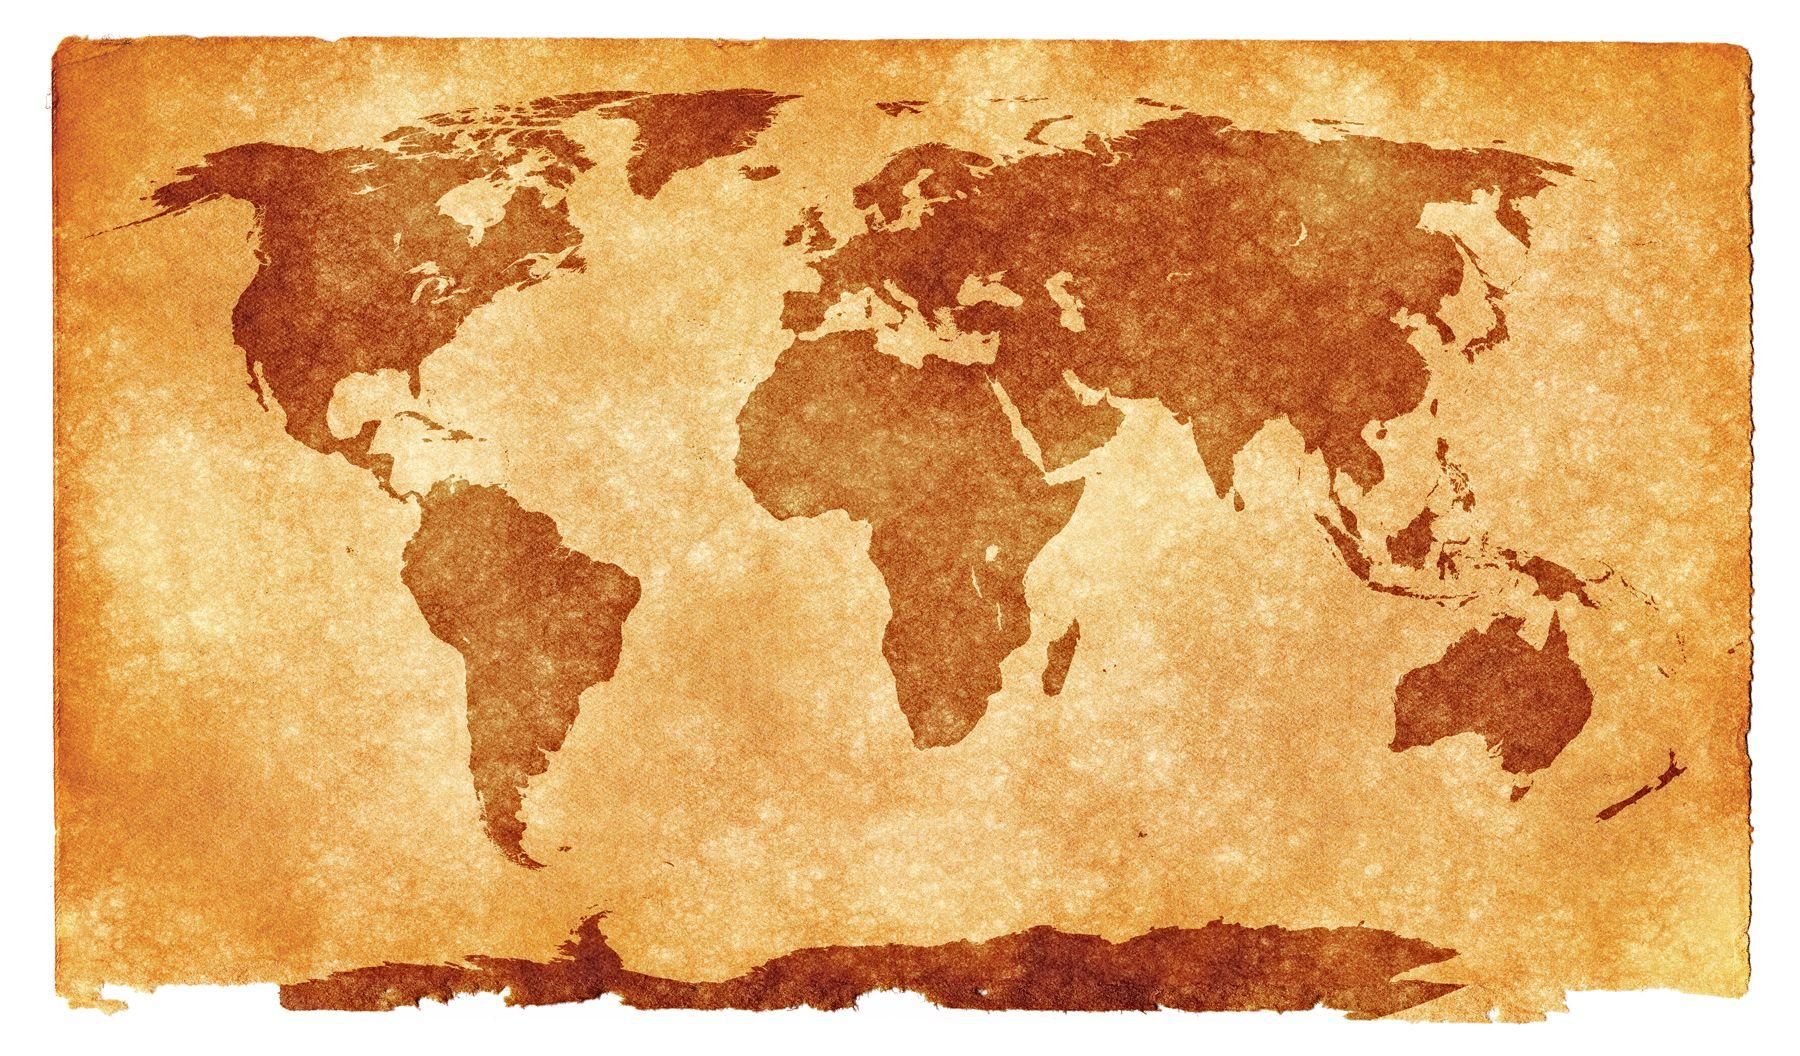 World Grunge Map Sepia World Map Poster Old World Maps Grunge Textures